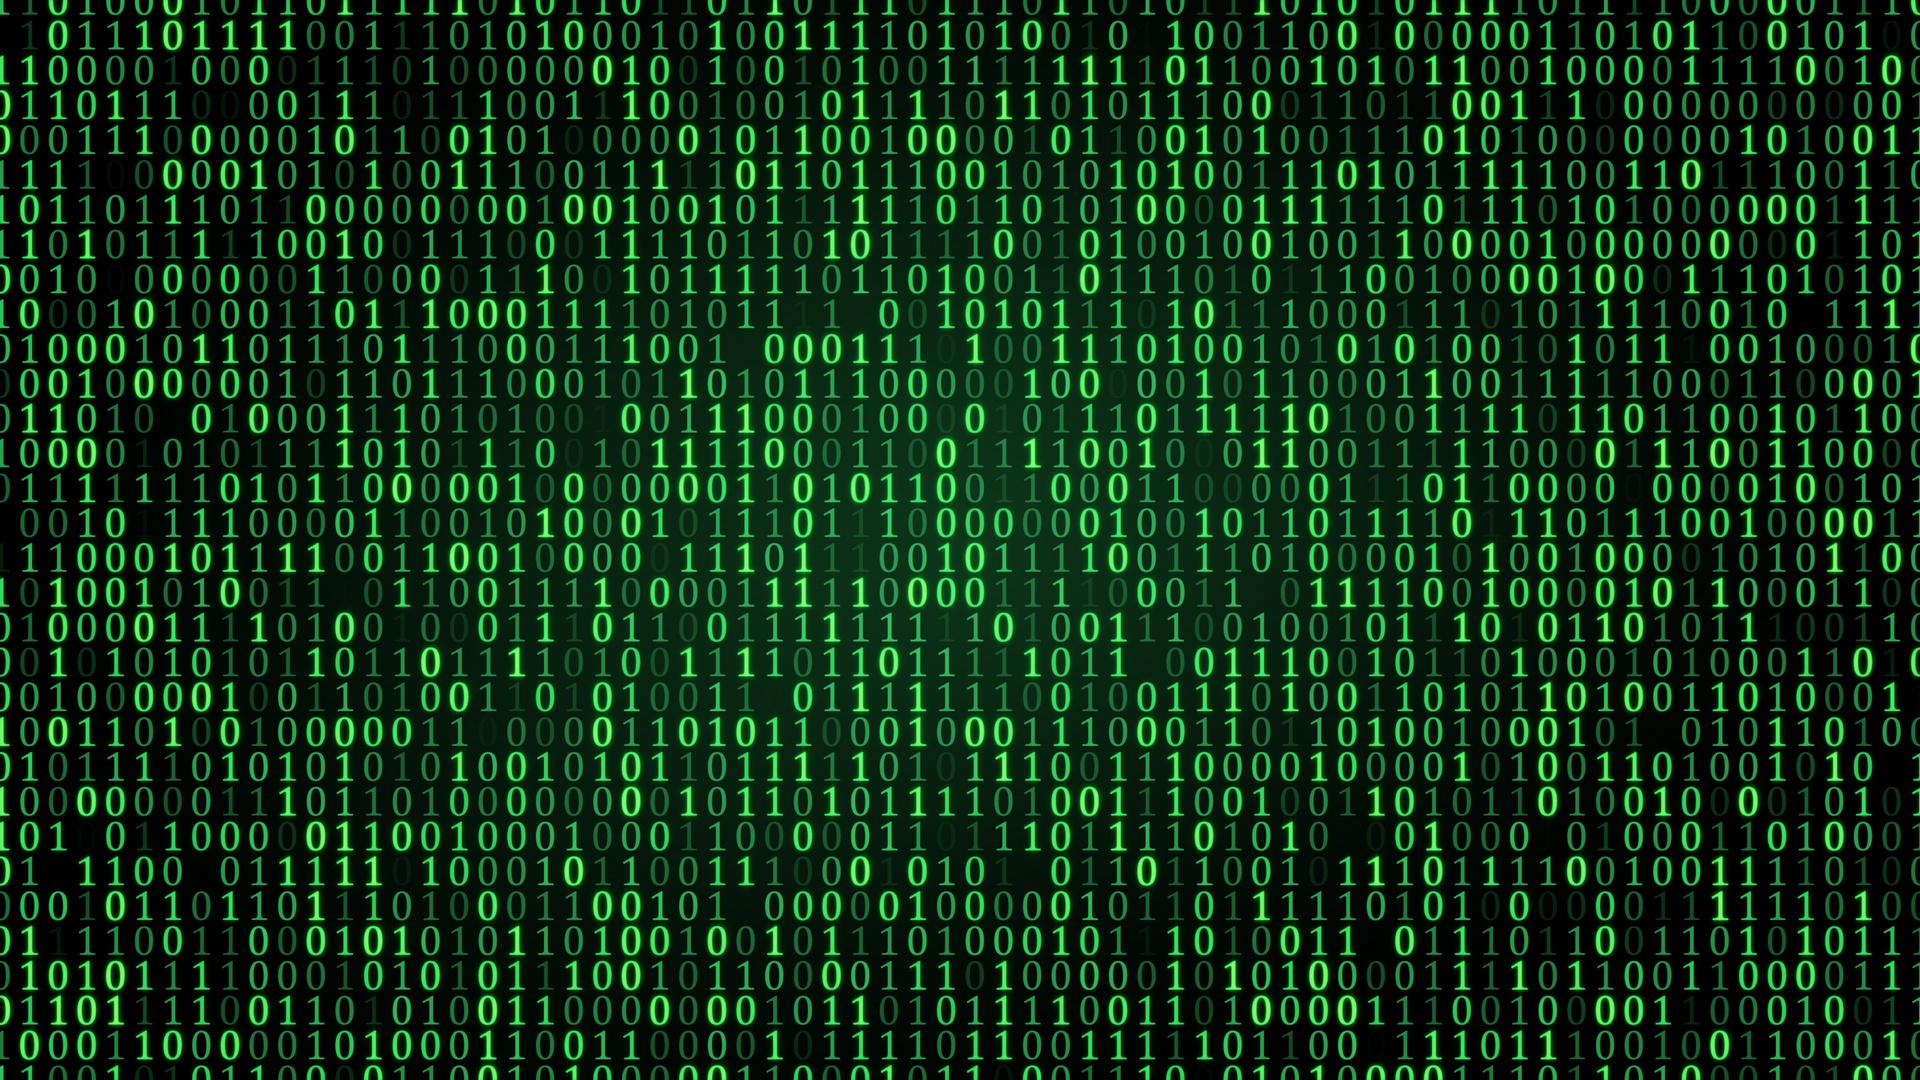 Datenstrategie DataOps Digitalisierung Digitale Transformation Datenökonomie